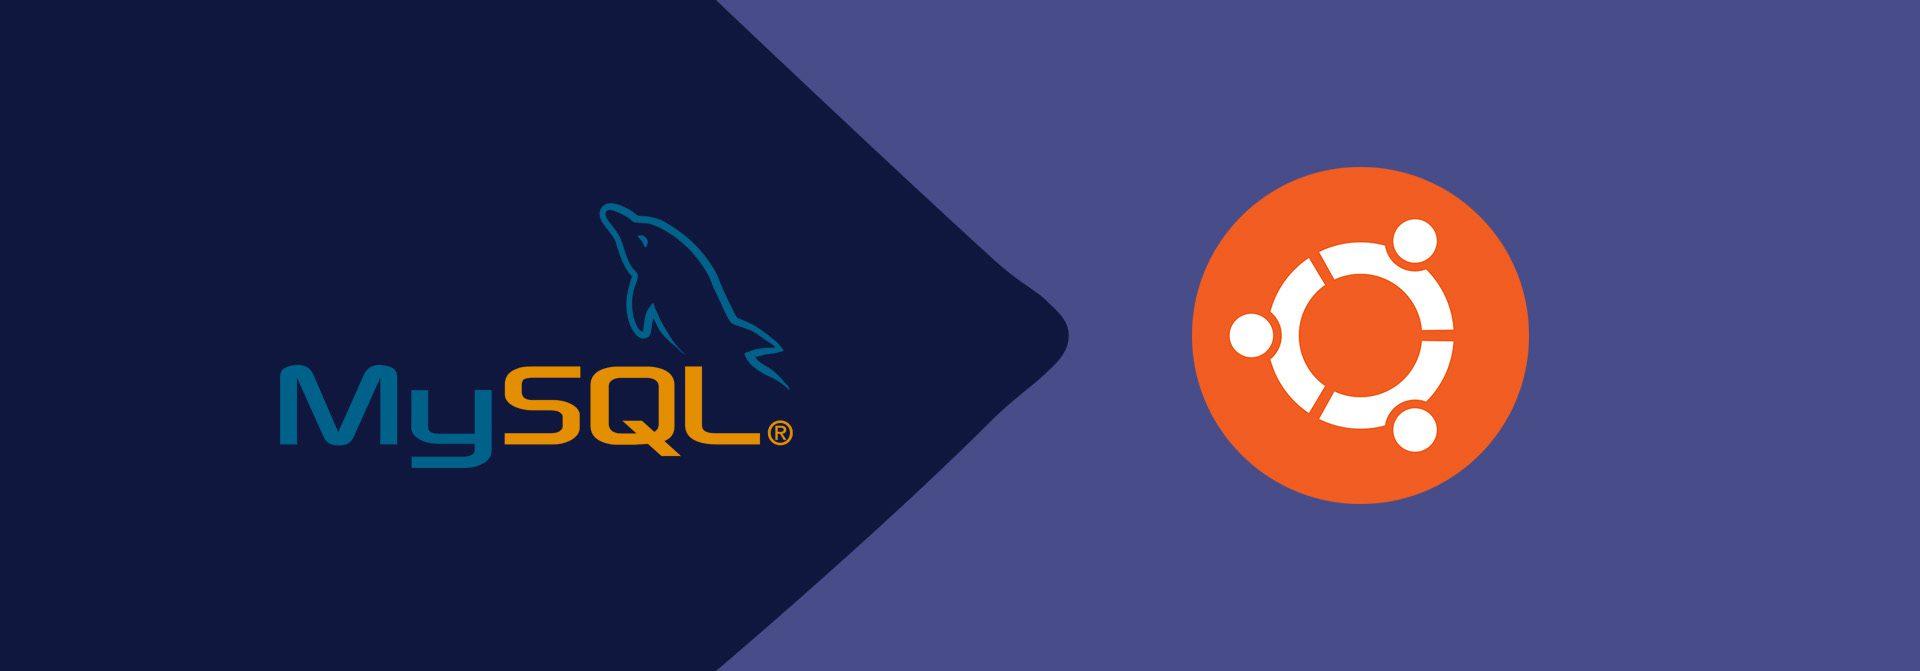 how-to-install-cai-dat-mysql-tren-ubuntu-20.04